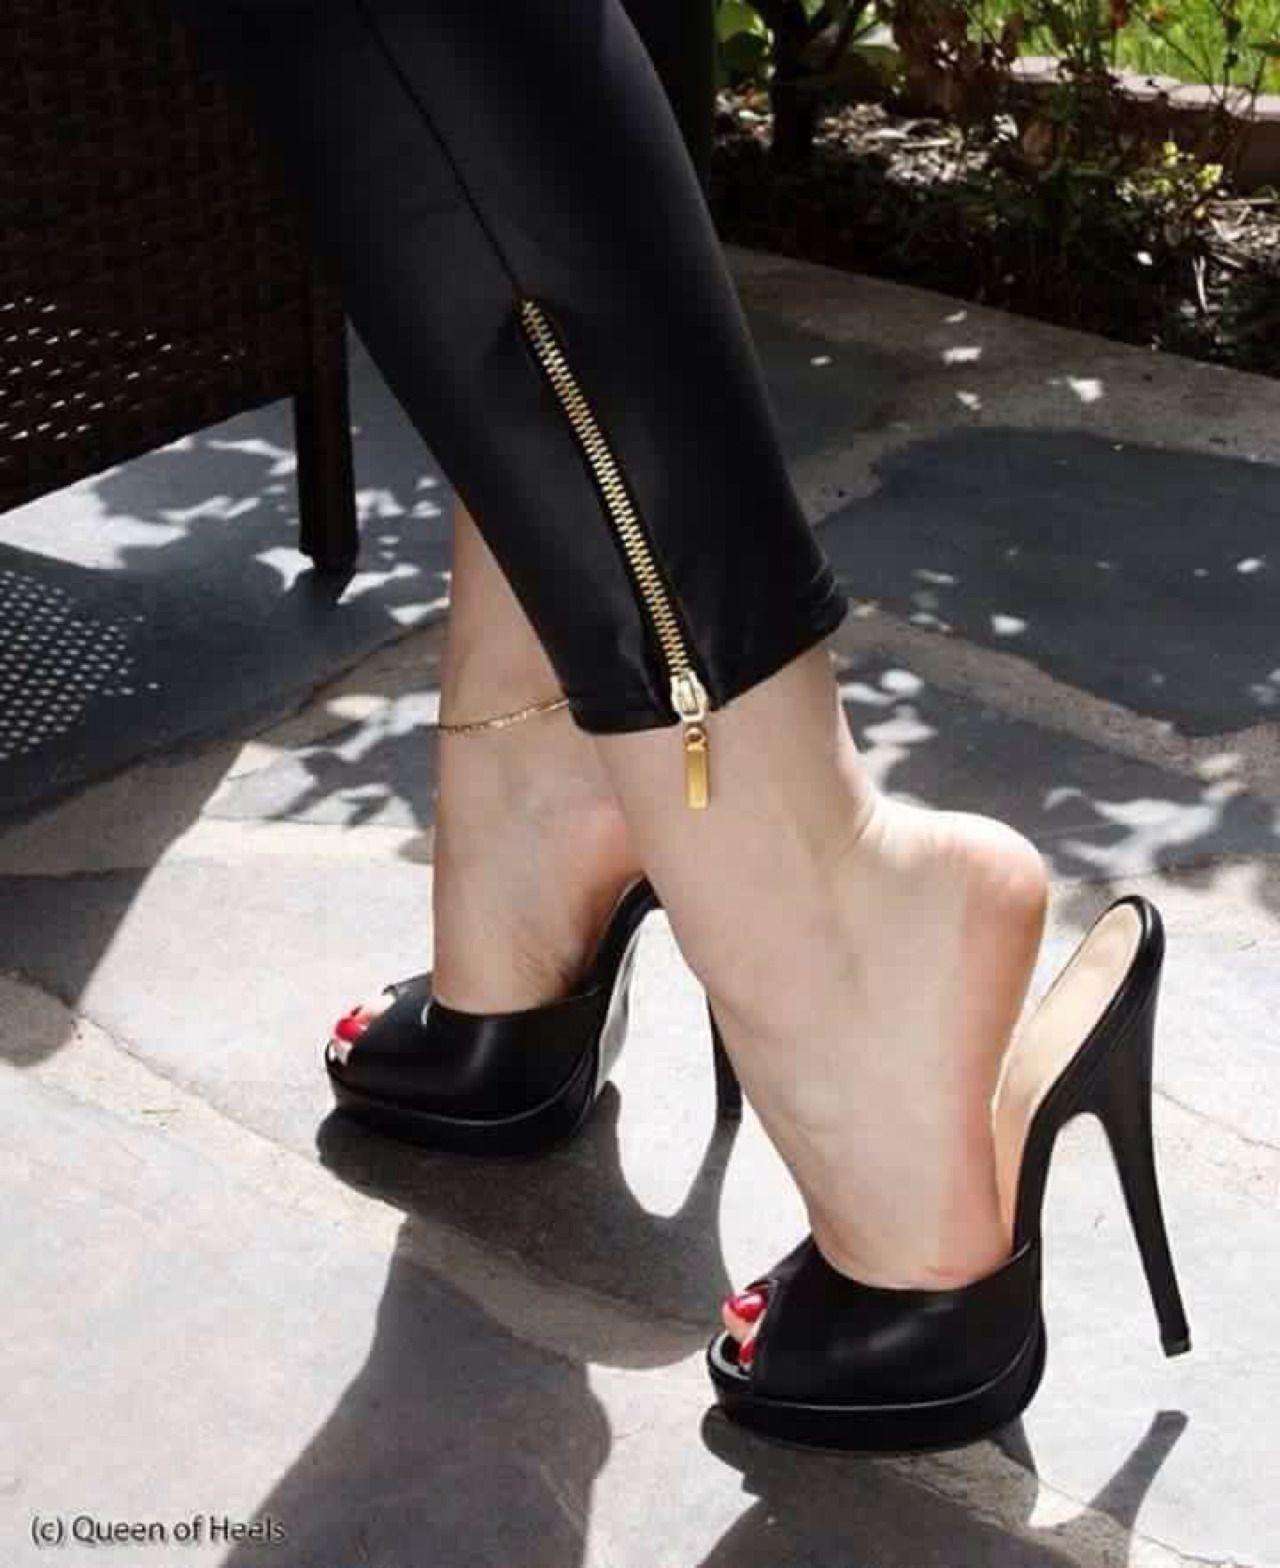 Very Schuhe Heelsamp; ShoeplayFeet Hochhackige Toe Sexy Peep eCxBdor